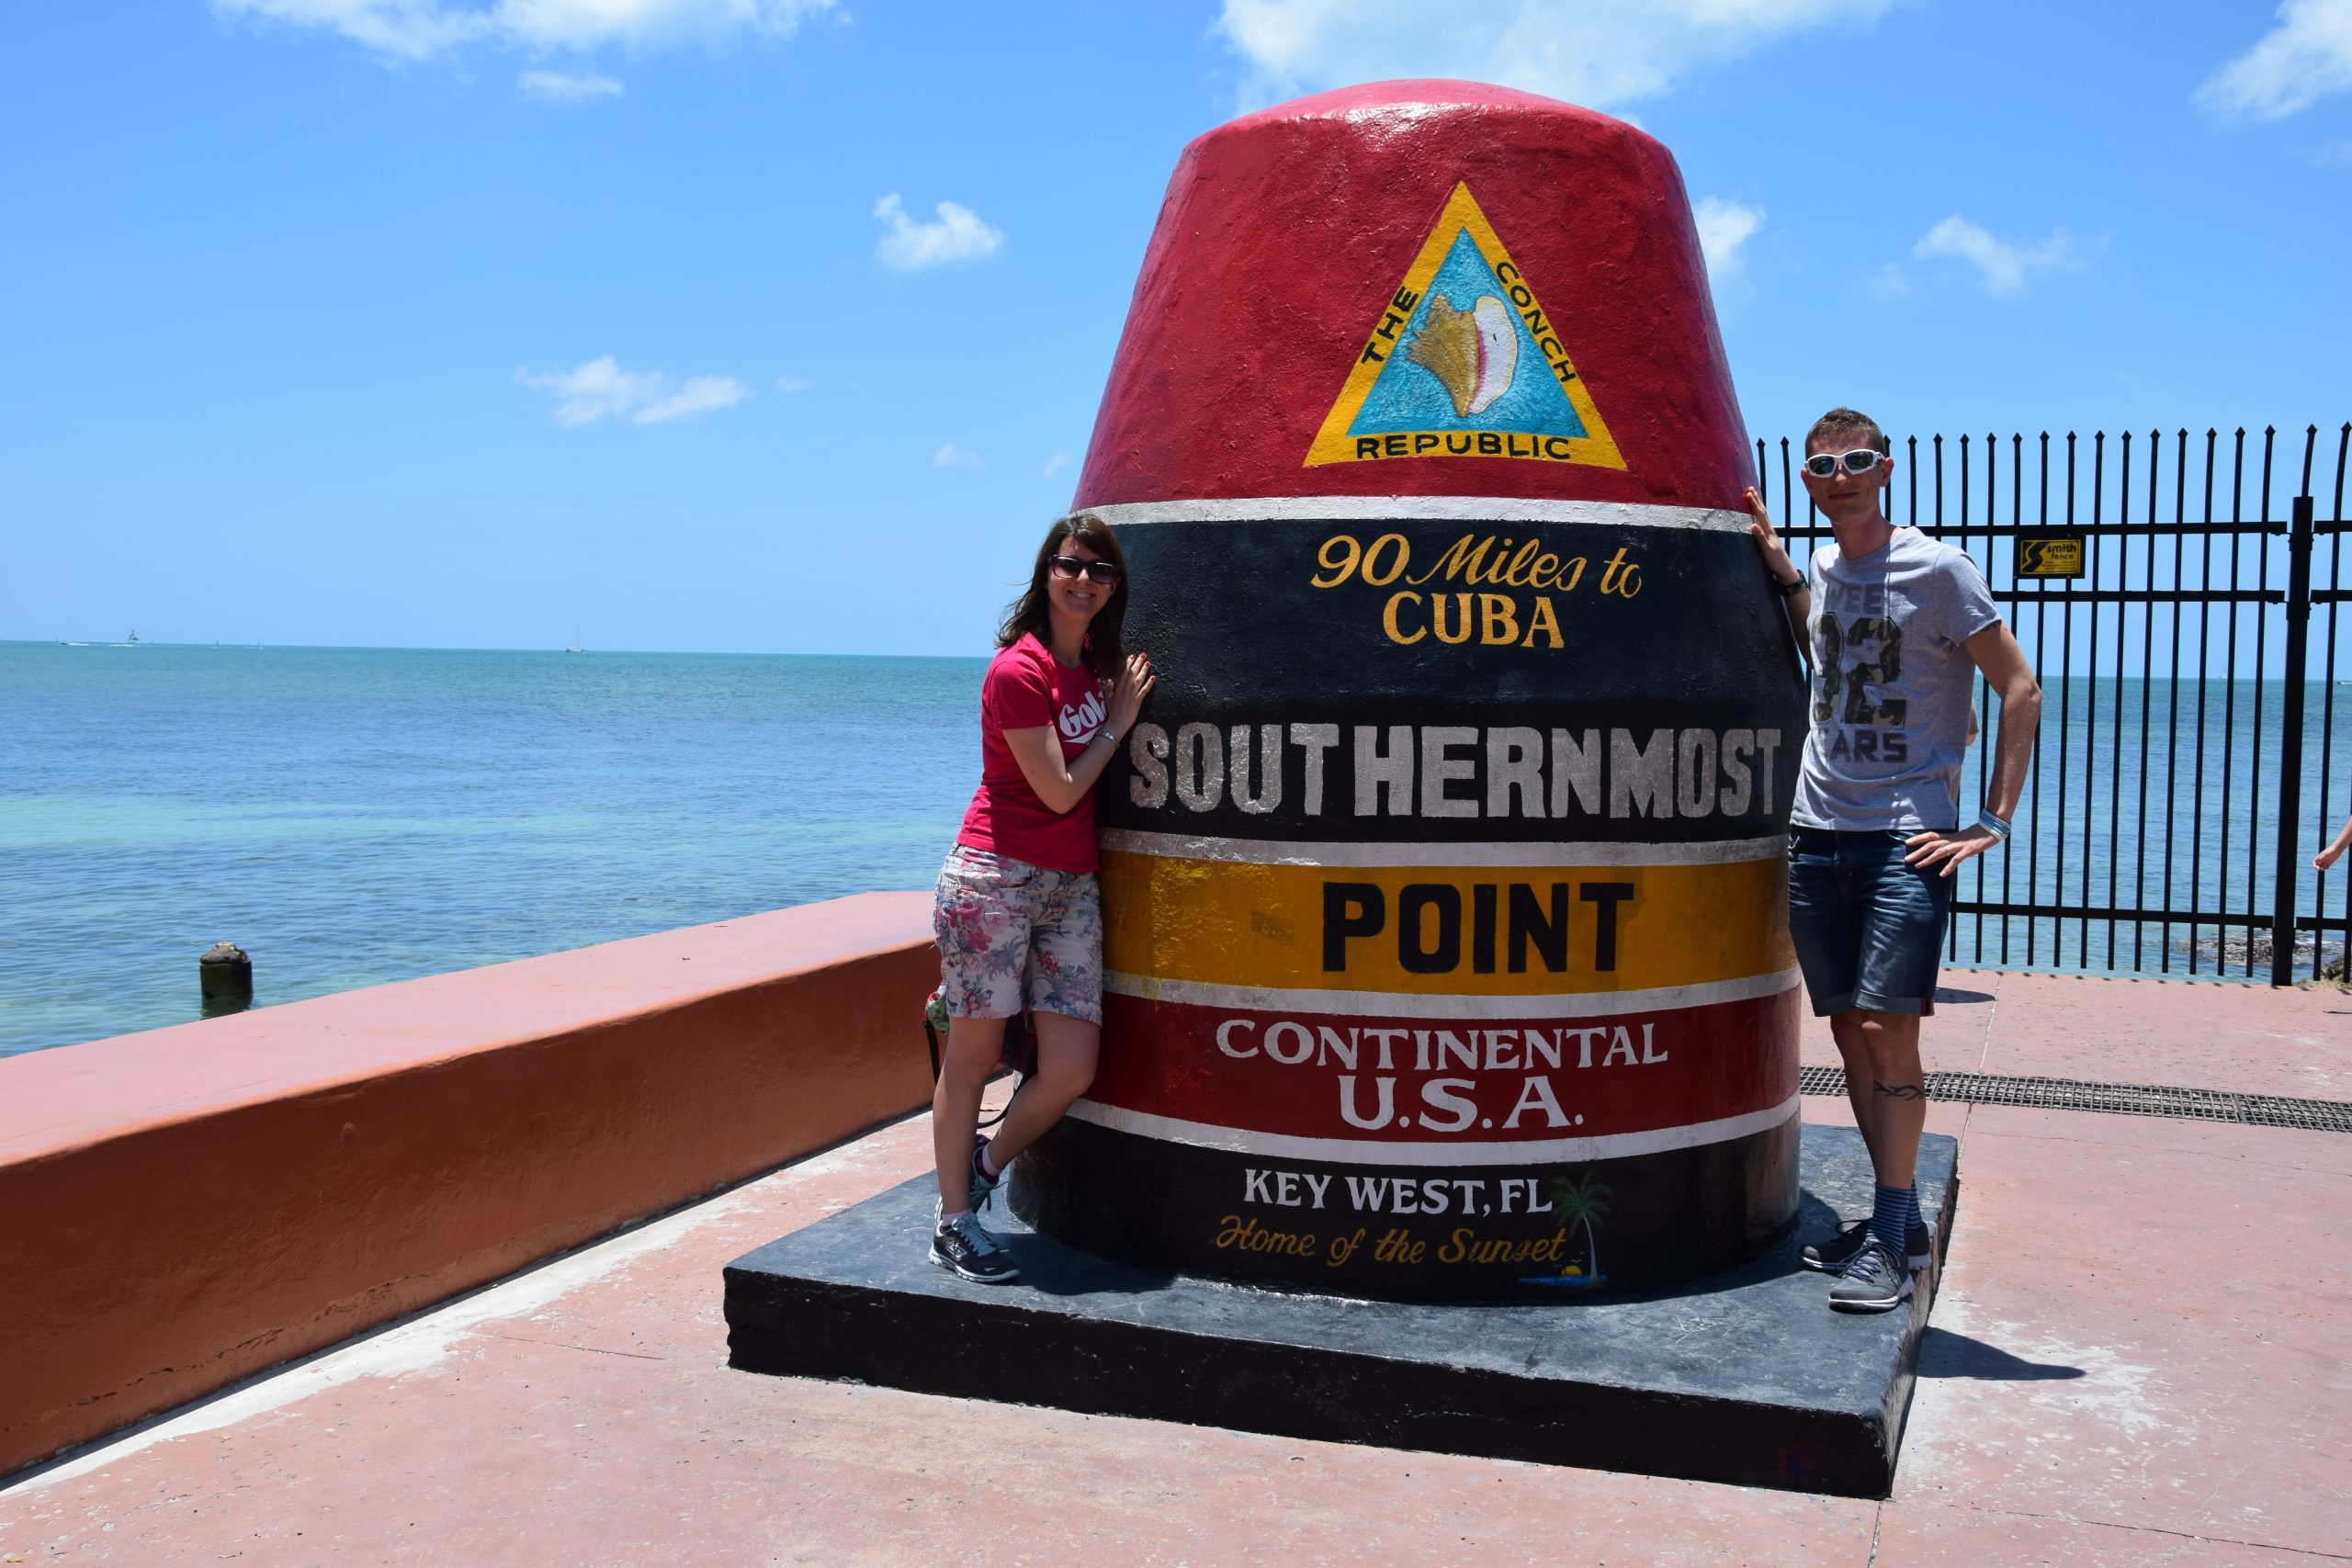 Boa di Key West